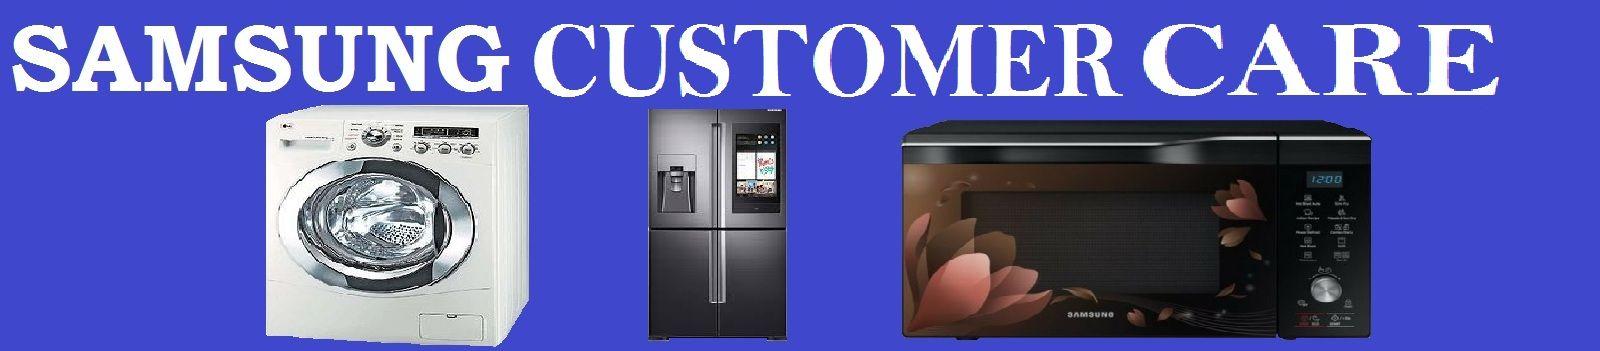 samsung washing machine customer care in delhi,noida